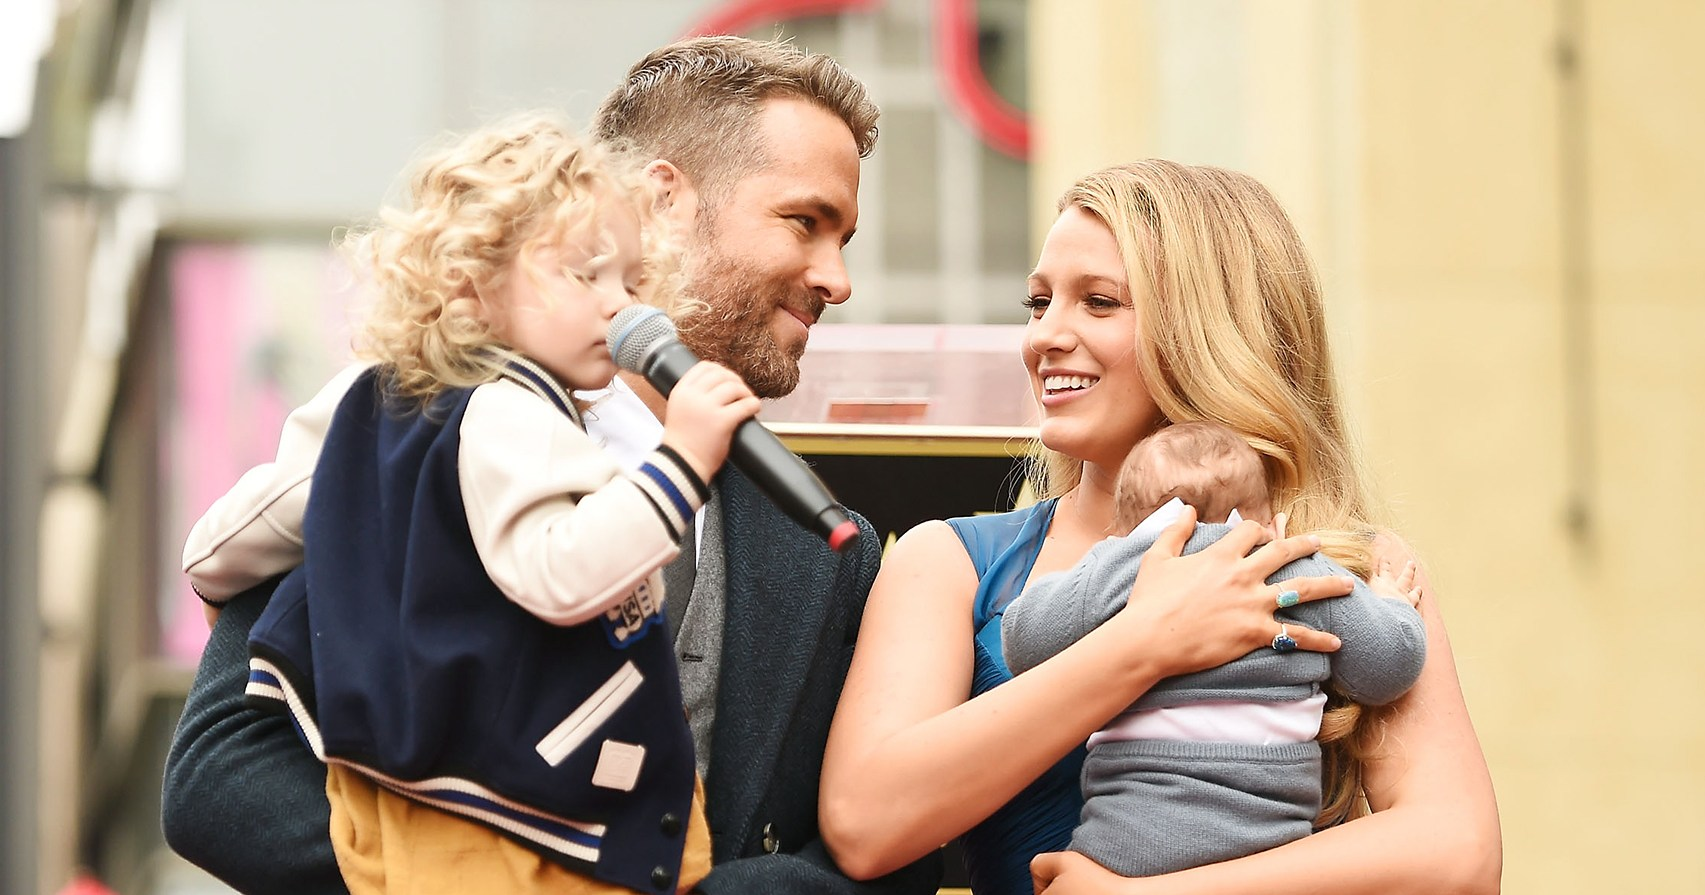 Ryan Reynolds Says 'No' to Having Baby No. 3 Soon